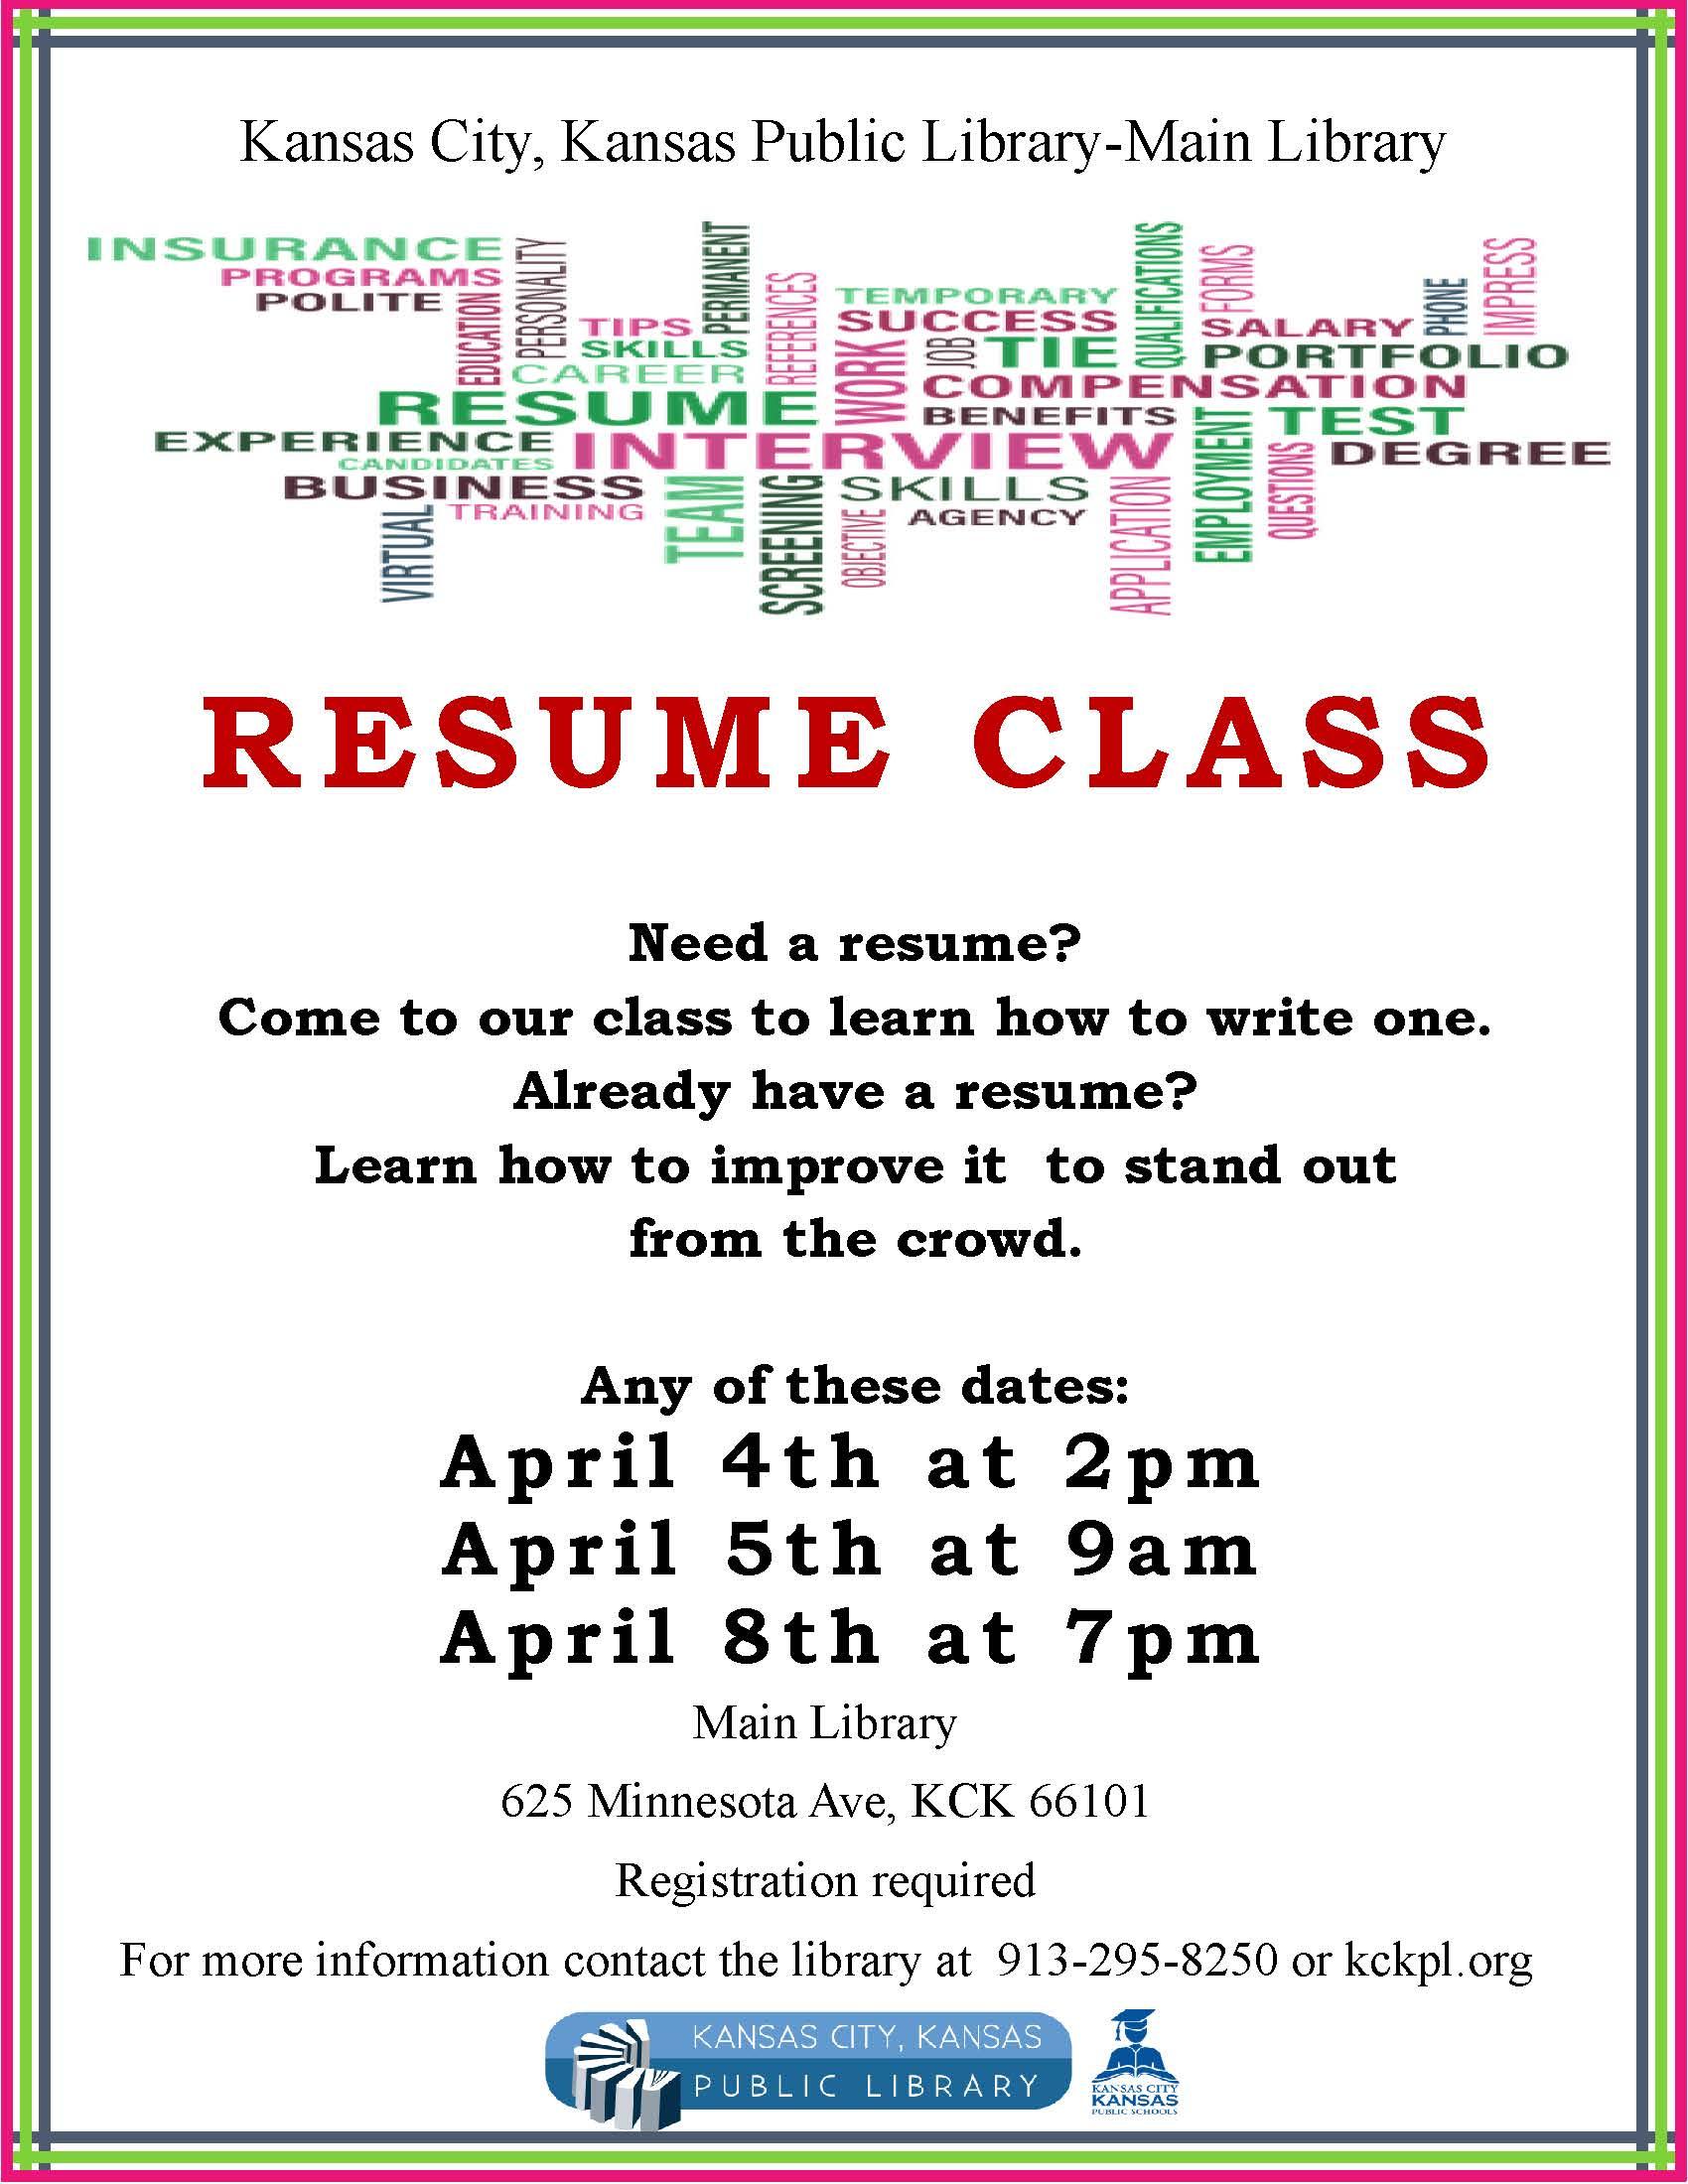 KCKPL Resume class.jpg